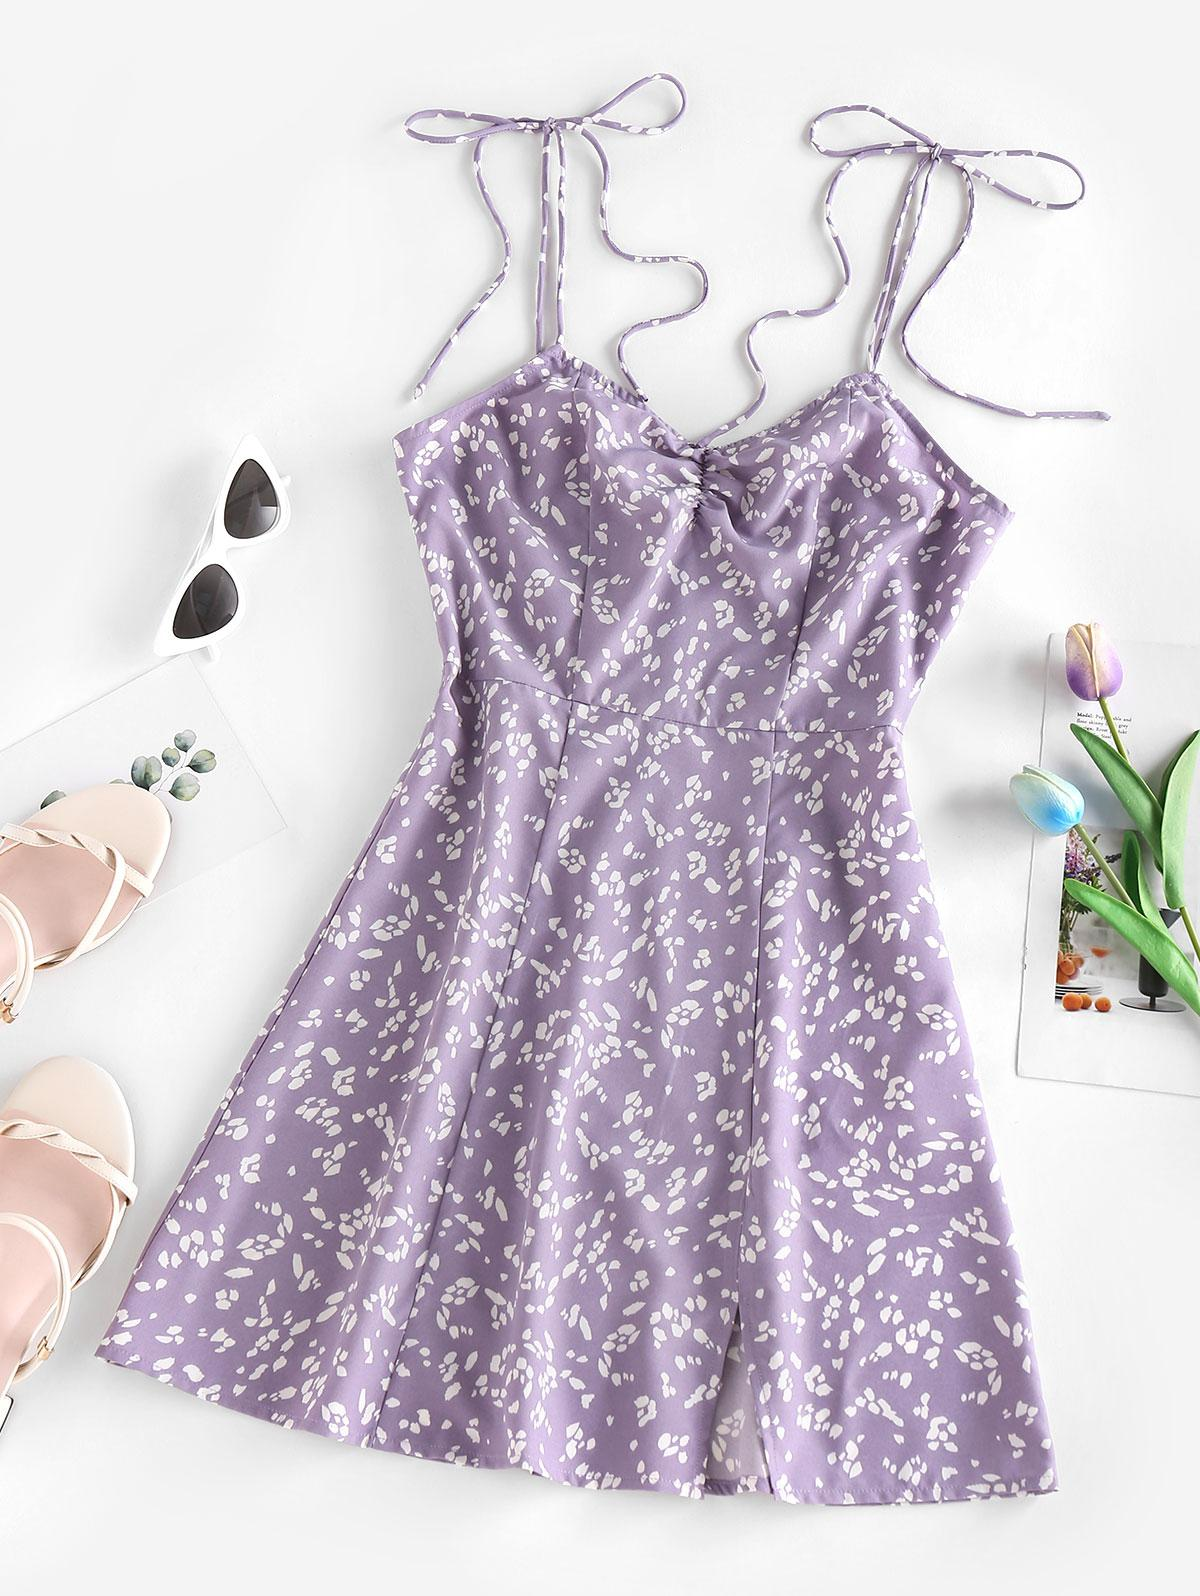 Zaful Ditsy Print Dress